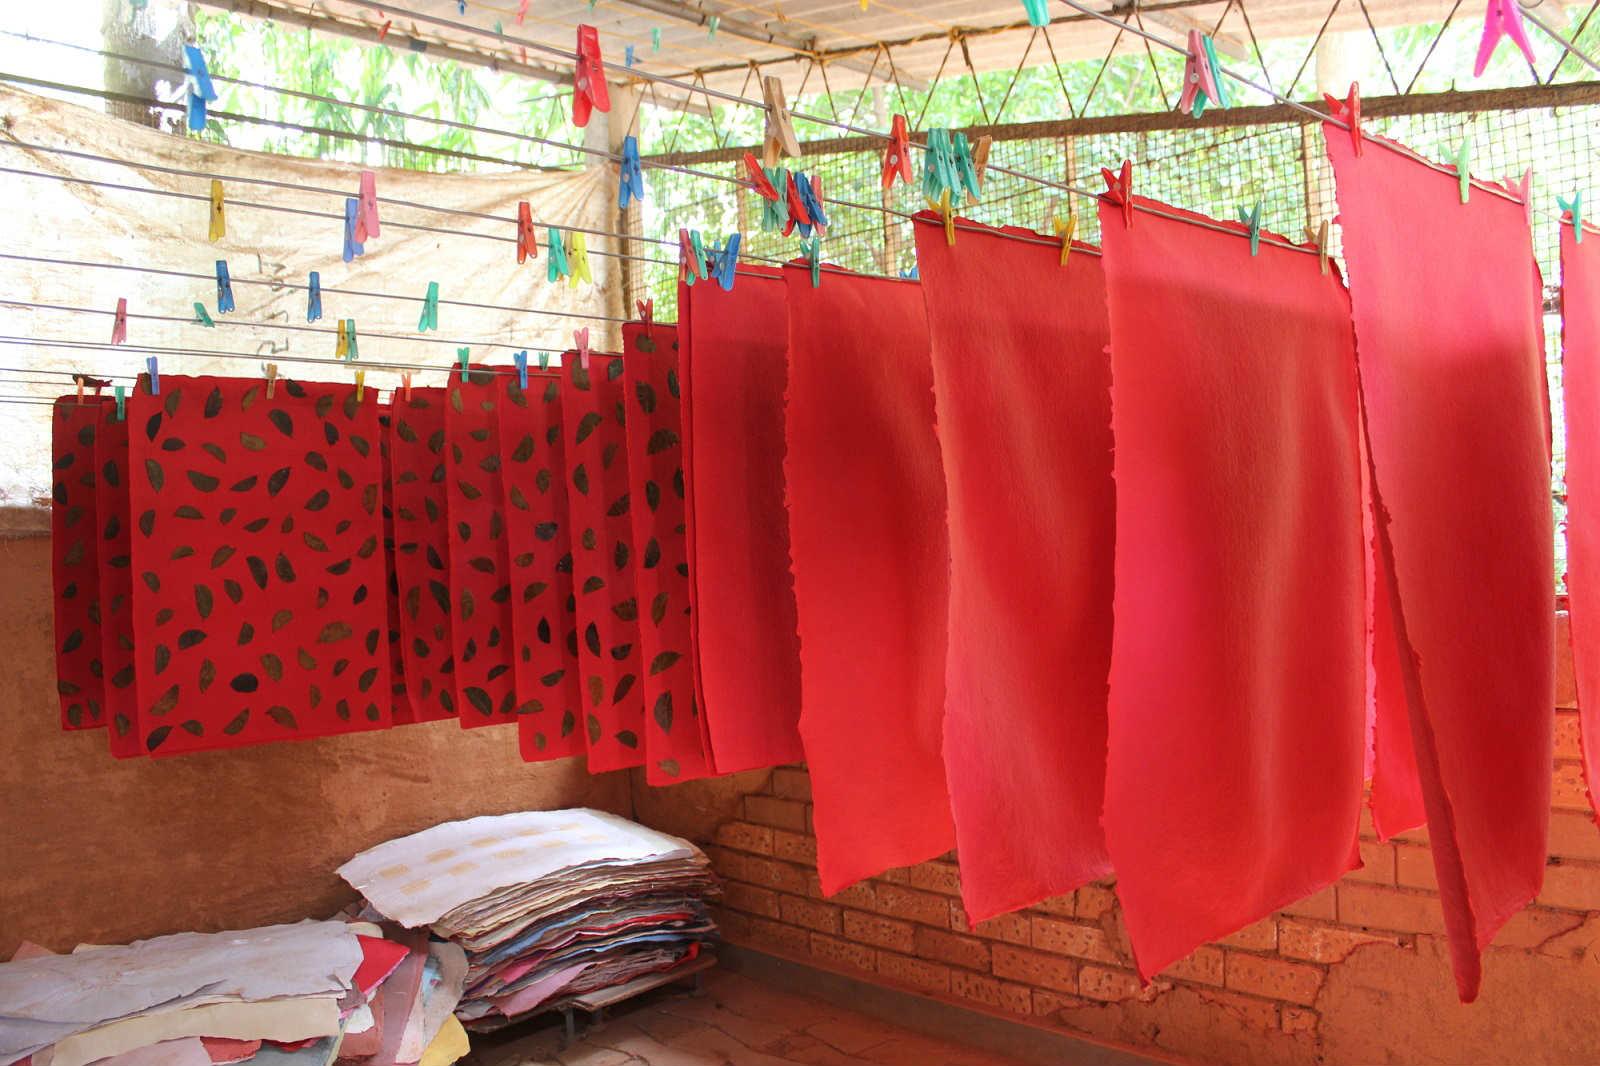 Handloom Textiles